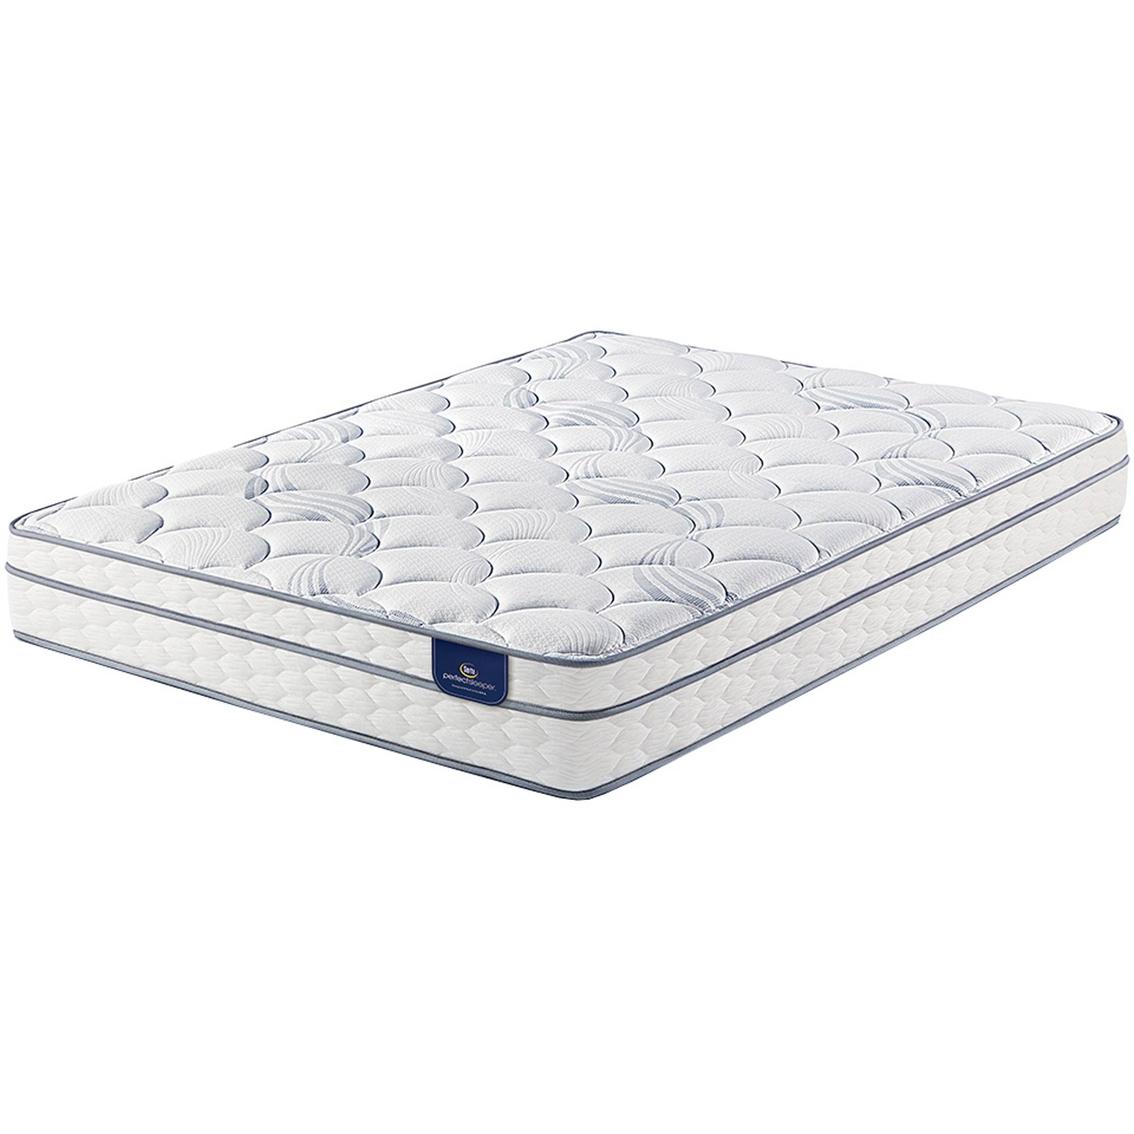 Serta Perfect Sleeper Overbrook Euro Top Mattress Saturday Wk 77